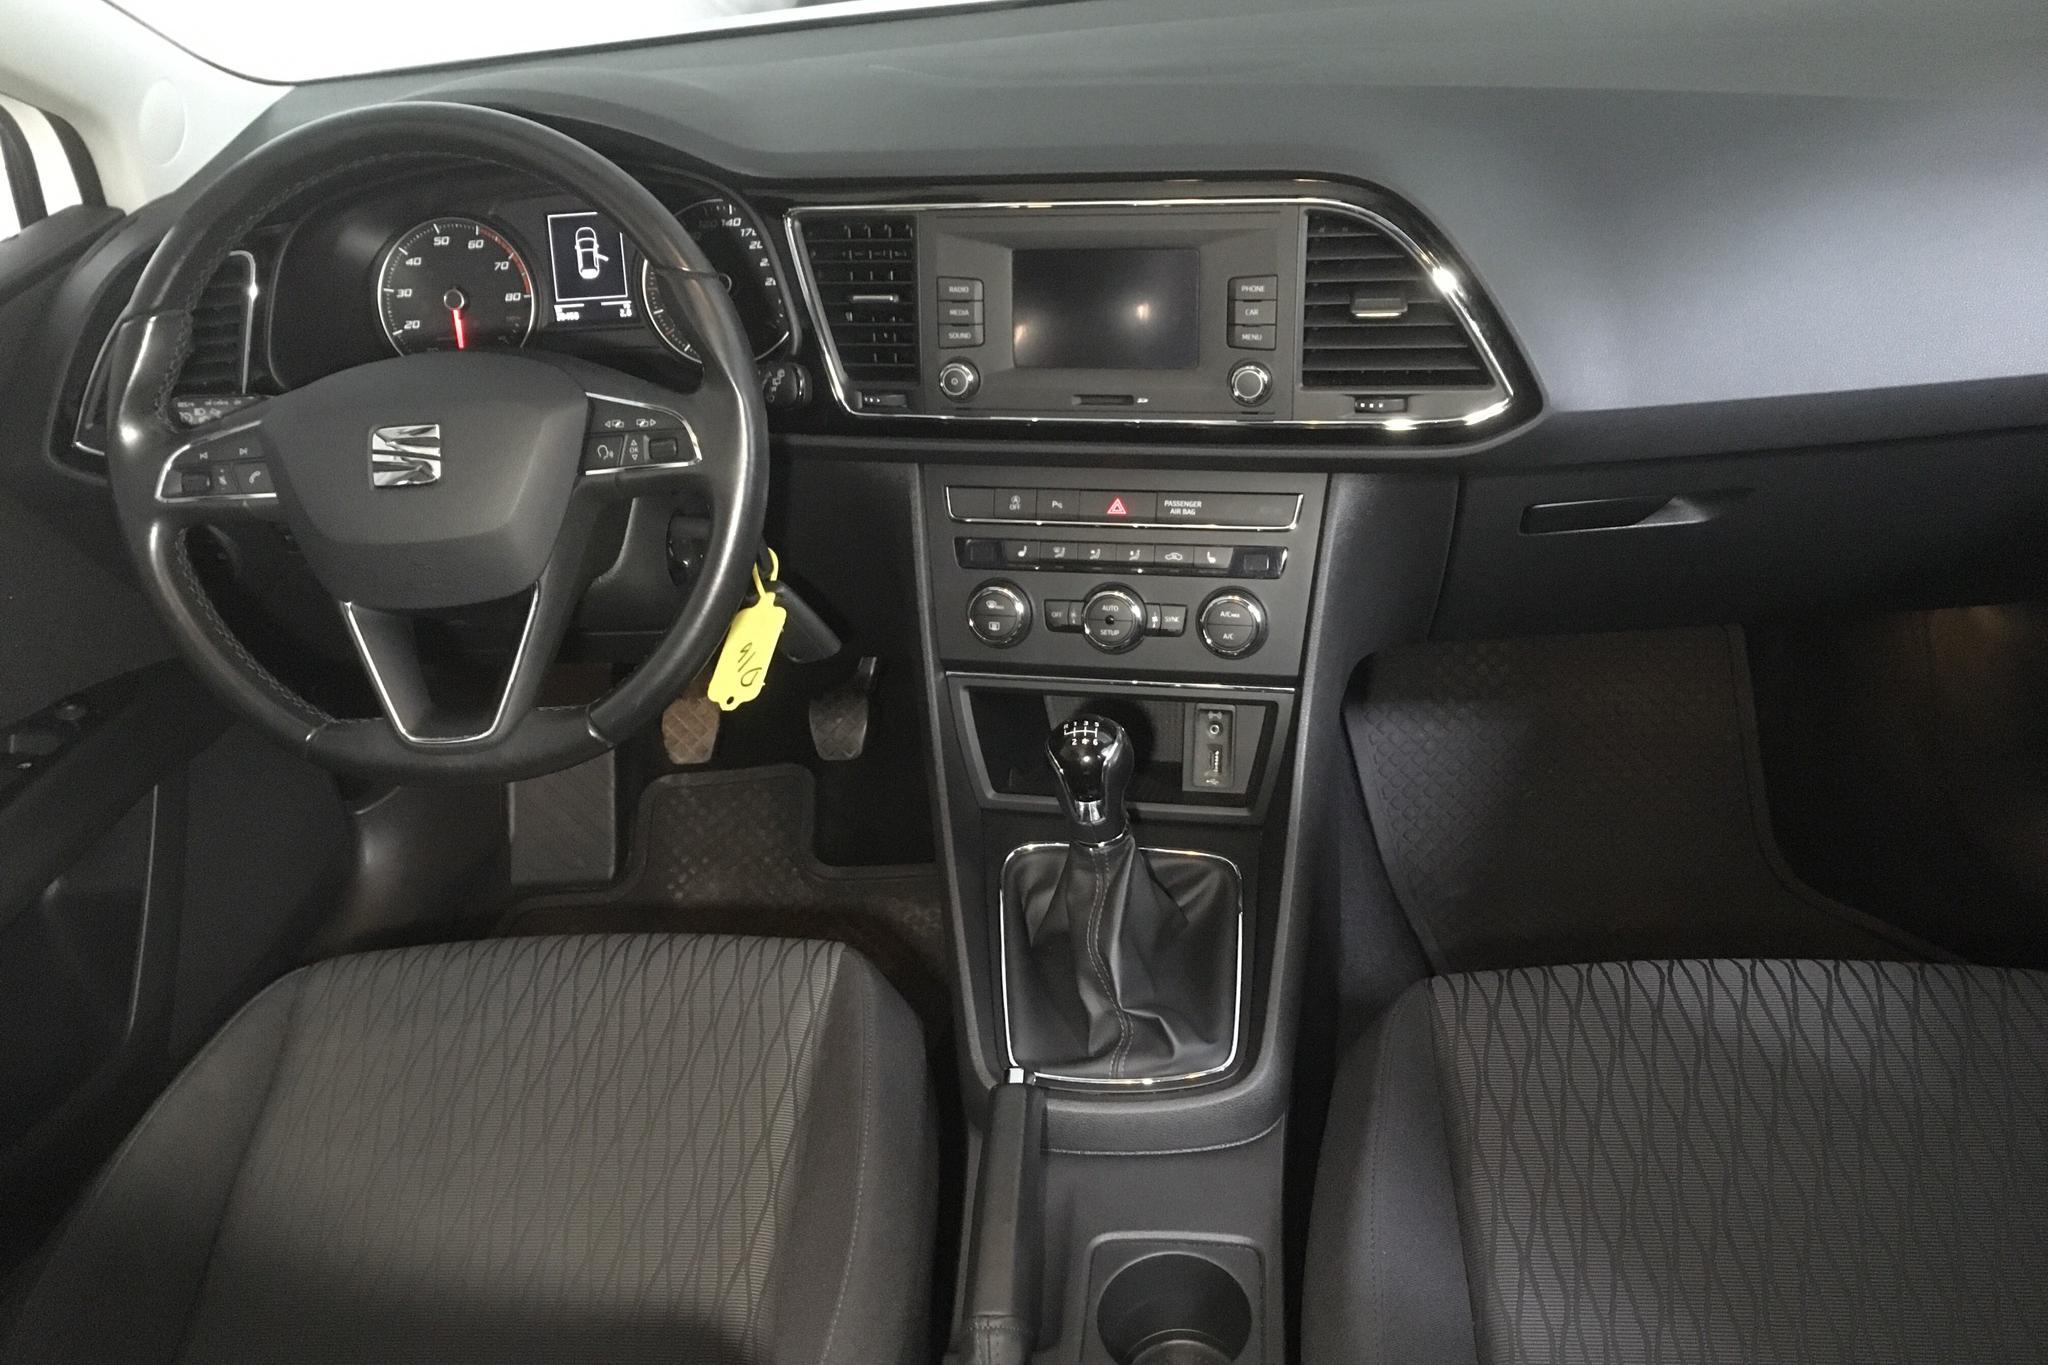 Seat Leon 1.2 TSI ST (110hk) - 39 450 km - Manual - white - 2016